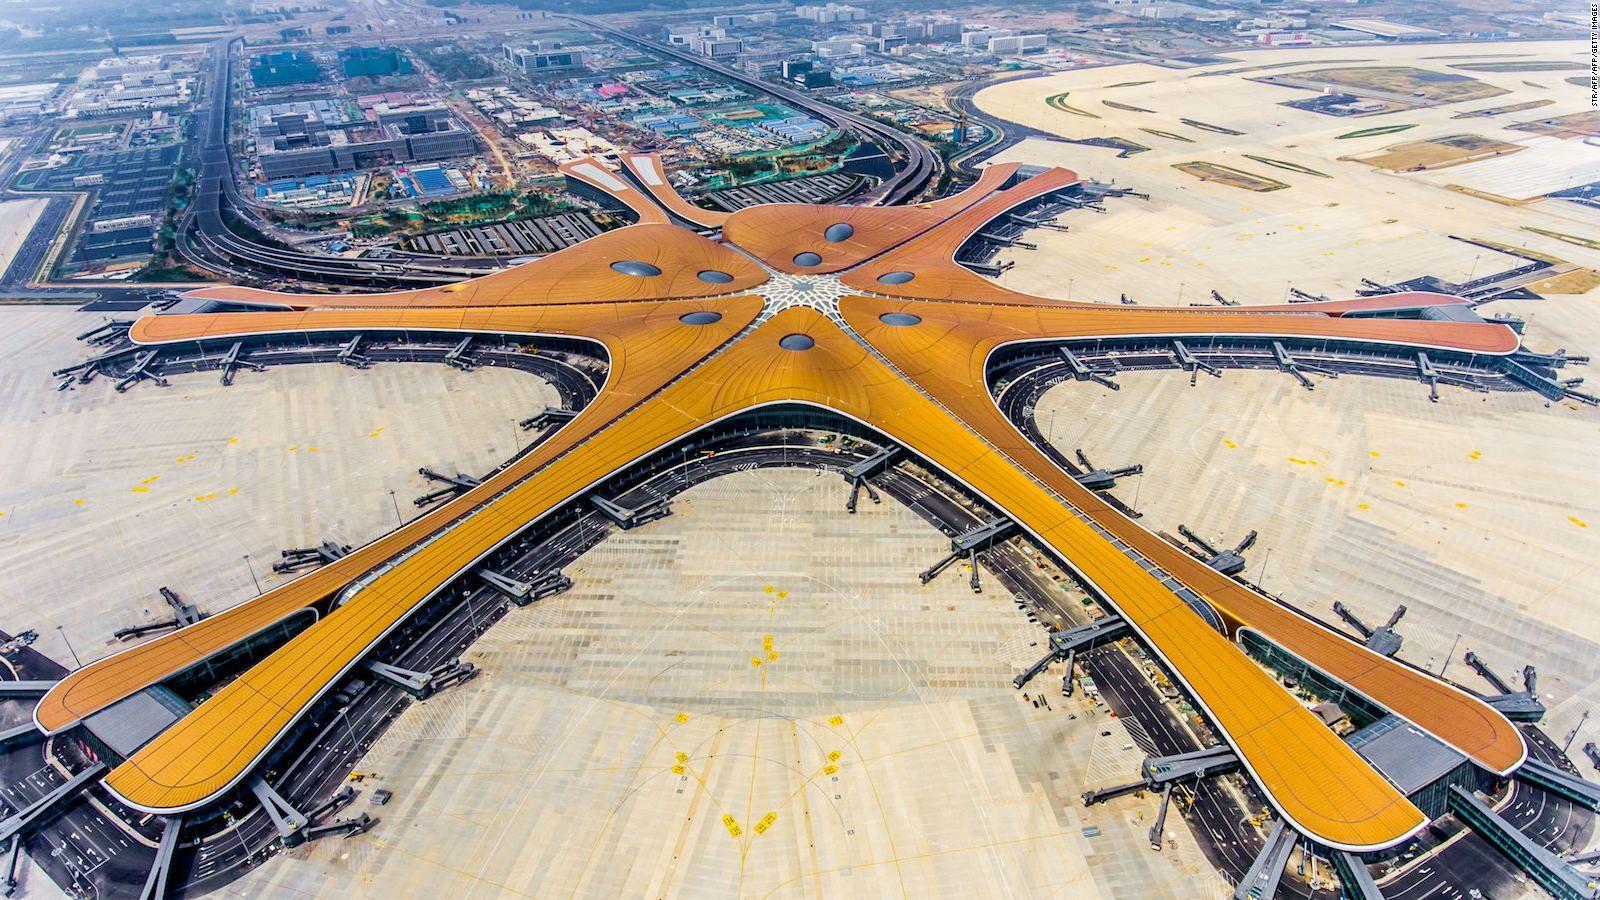 190918141650-beijing-daxing-international-airport-aerial-full-169.jpg